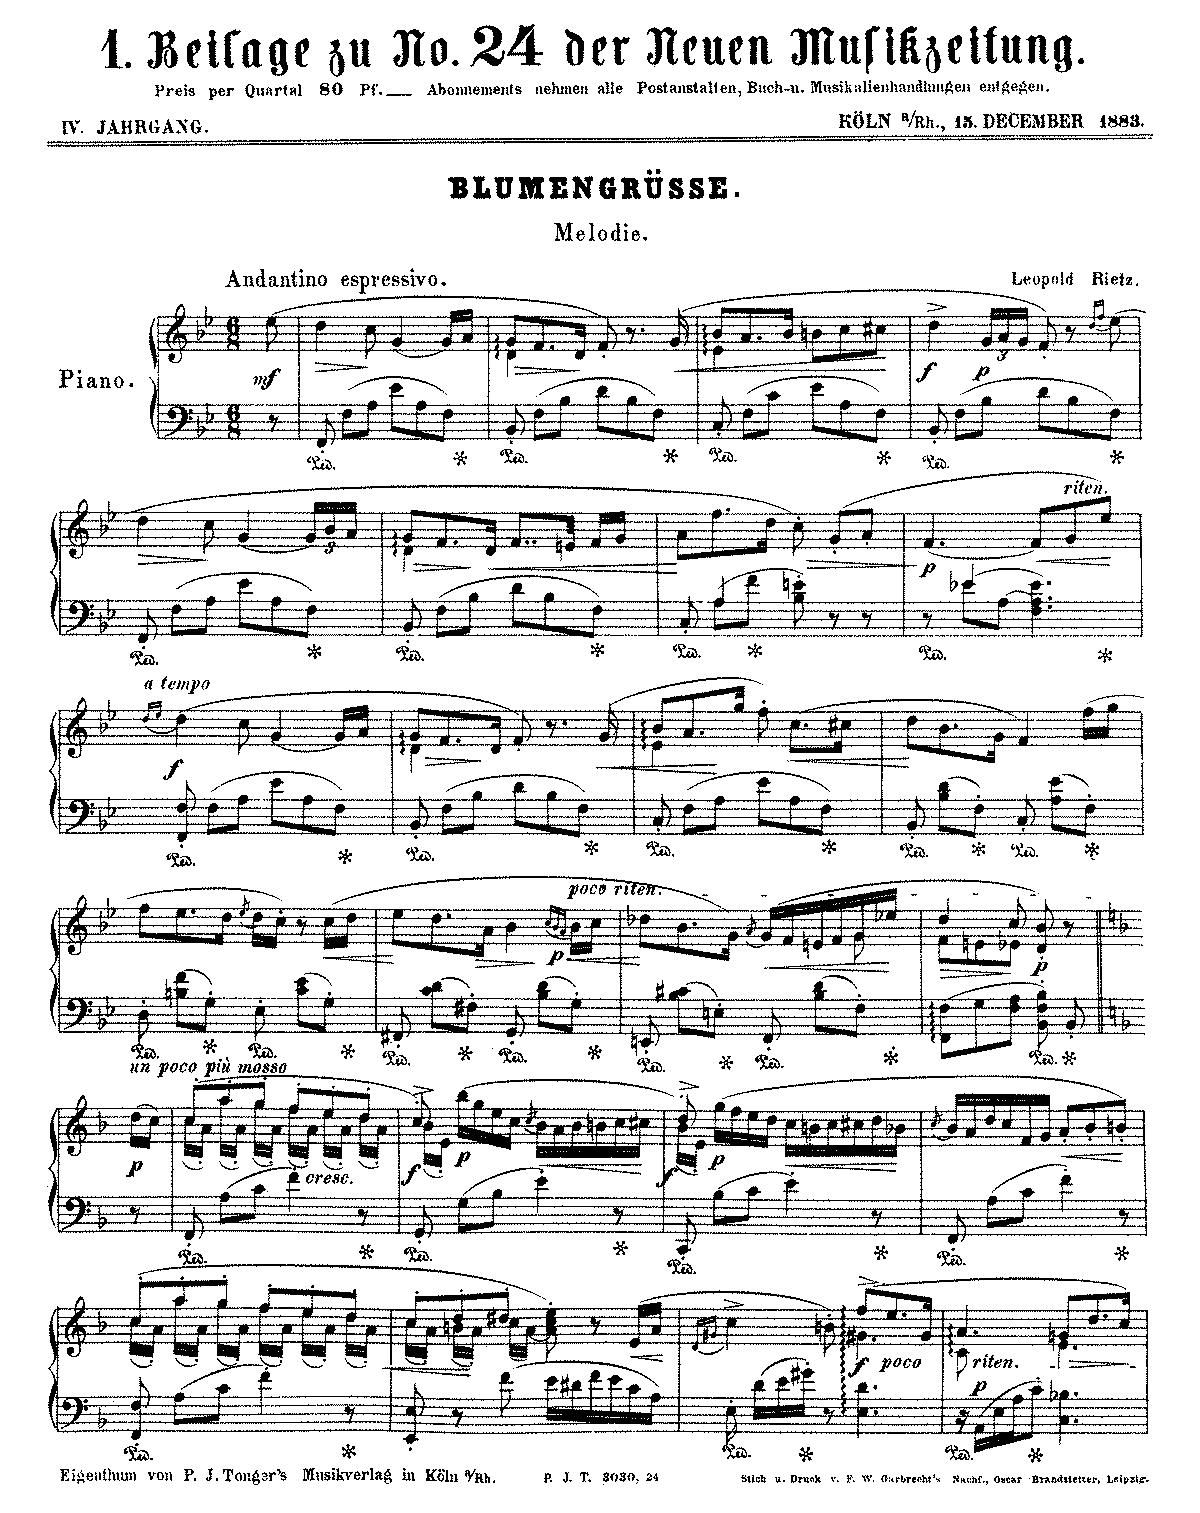 Blumengrüsse (Rietz, Leopold) - IMSLP/Petrucci Music Library: Free